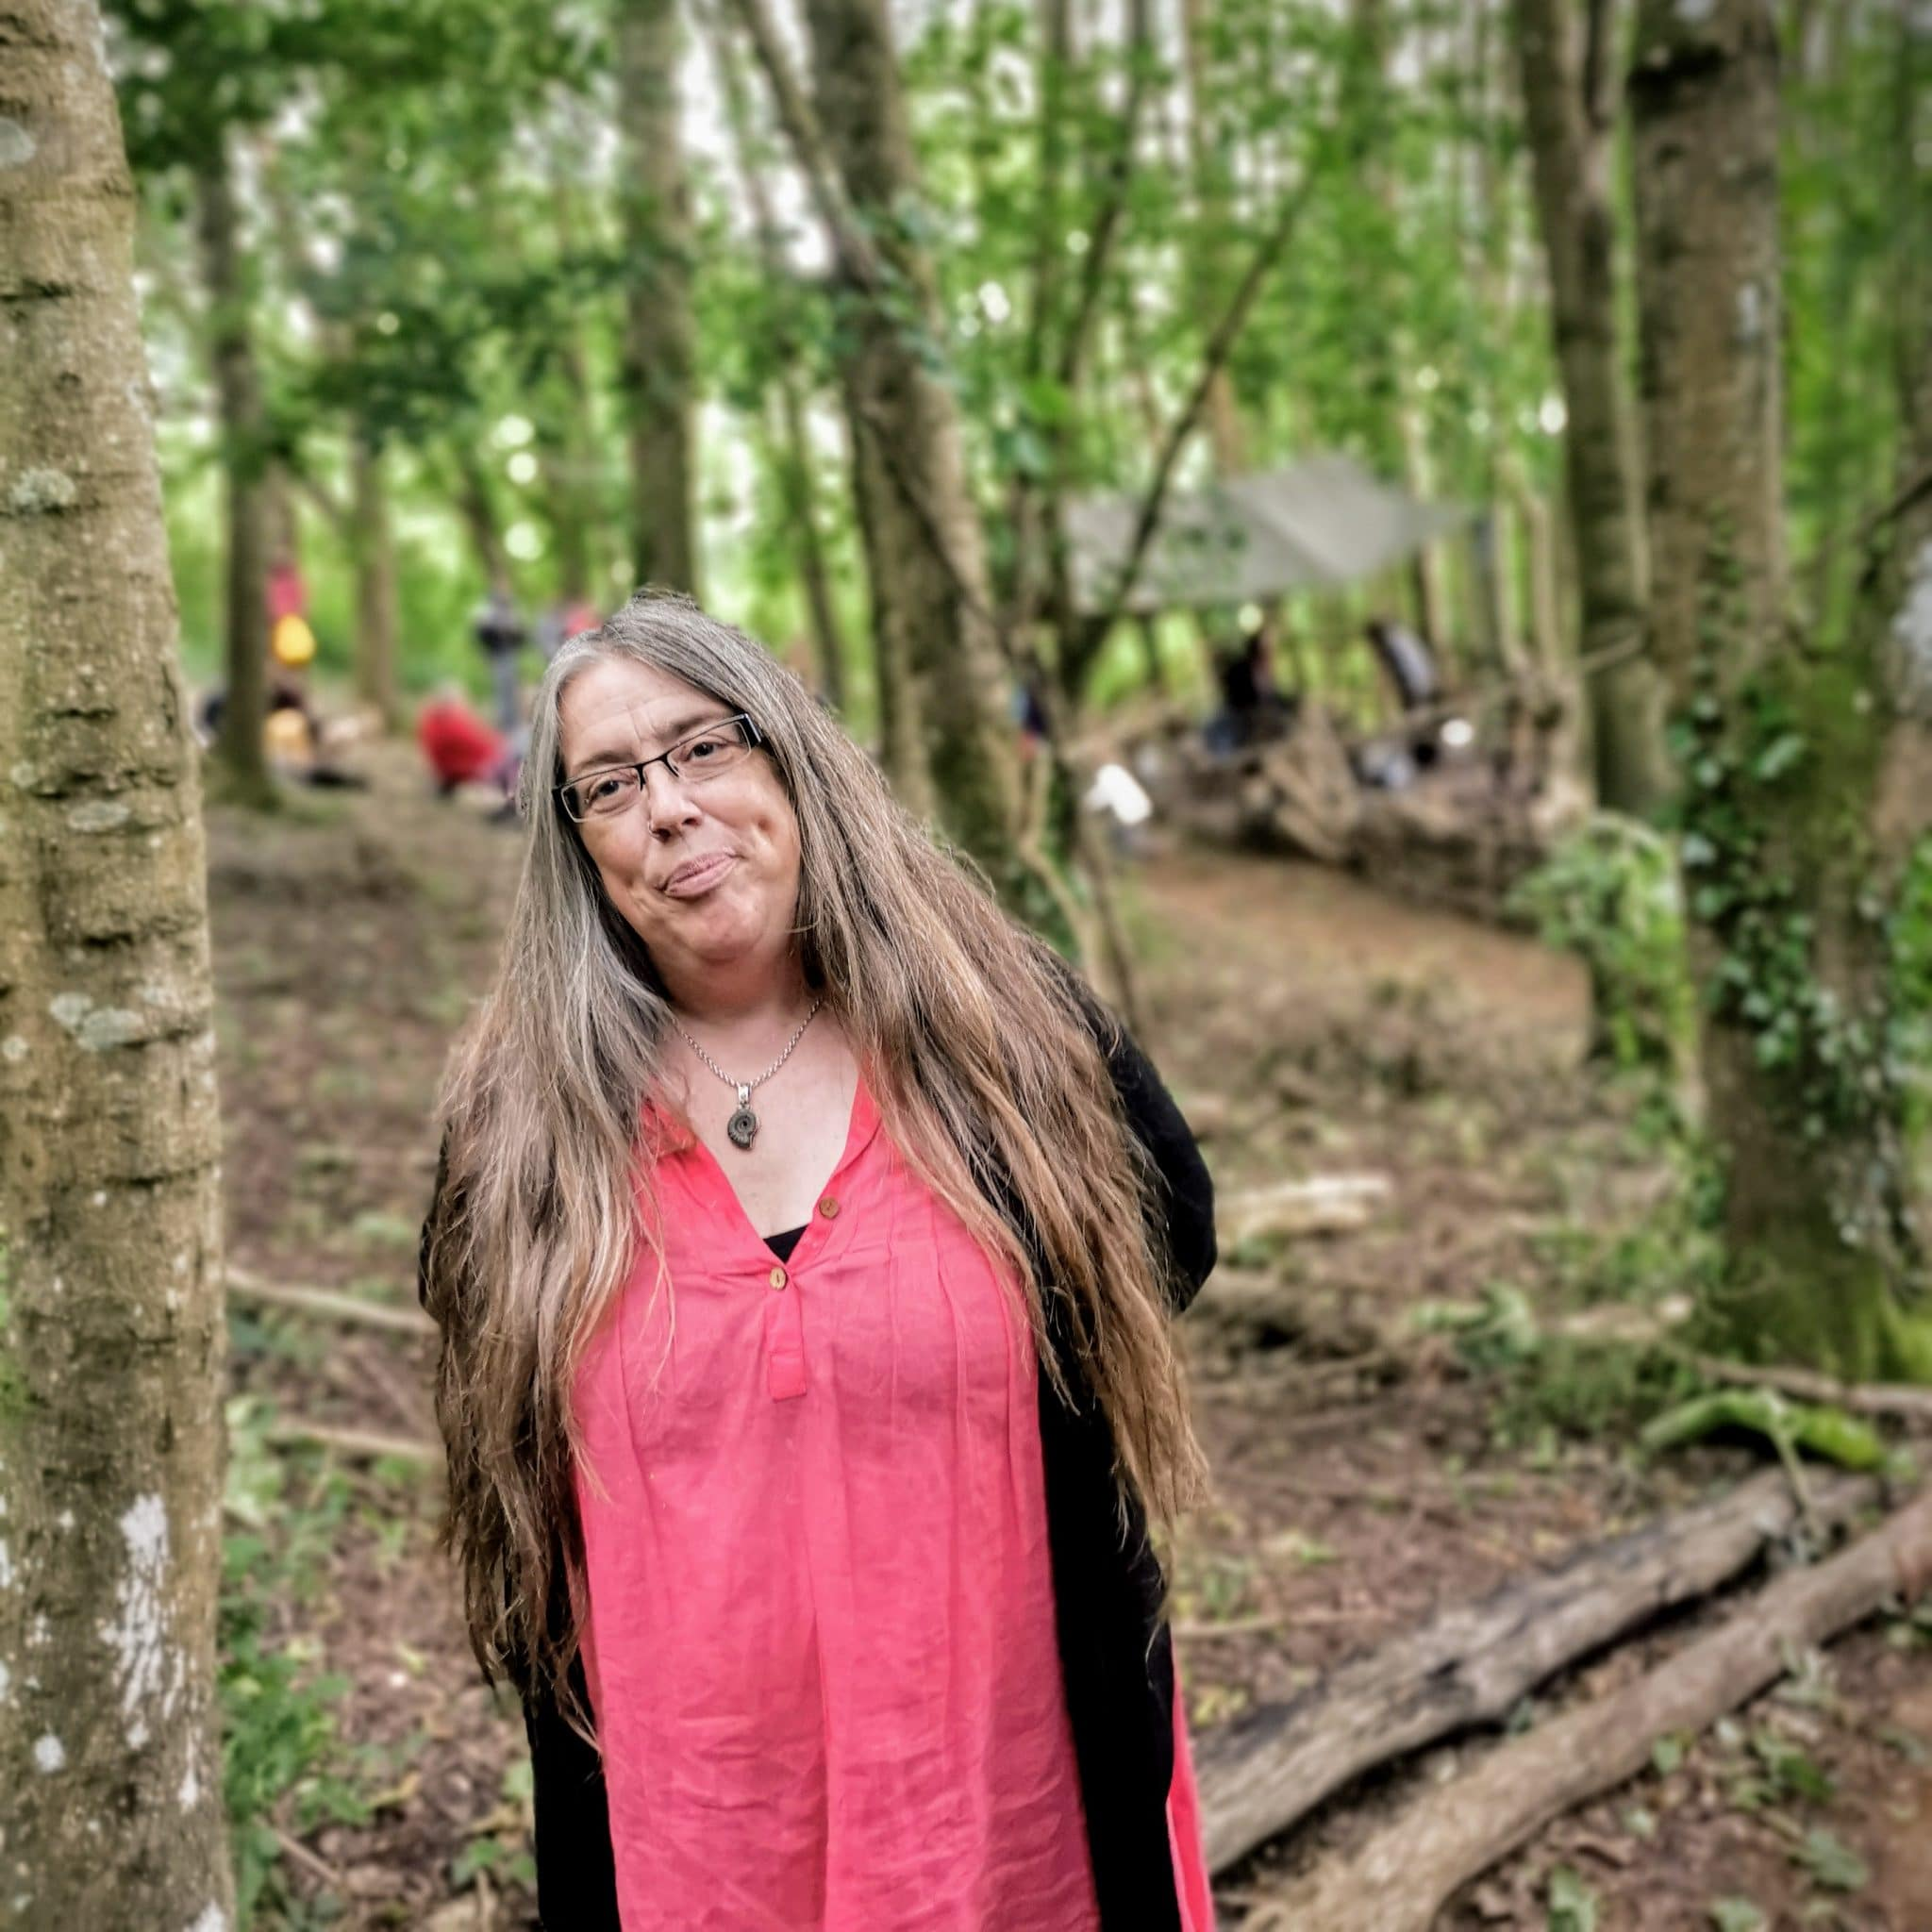 Vicki Steward at Hallr Woods